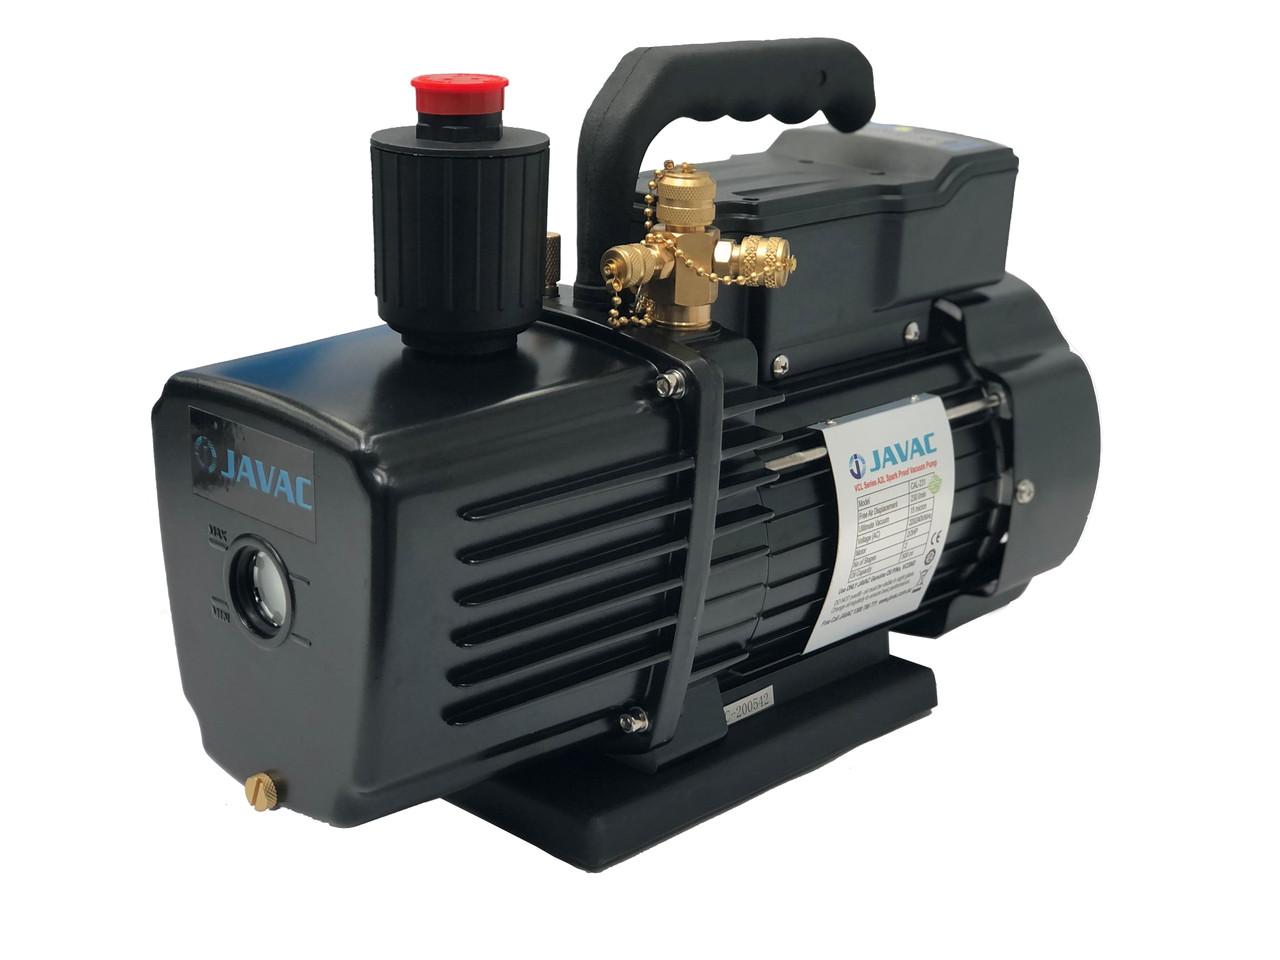 CAL - 281 Vacuum Pump (280L/min, 15 micron) R32 Rated